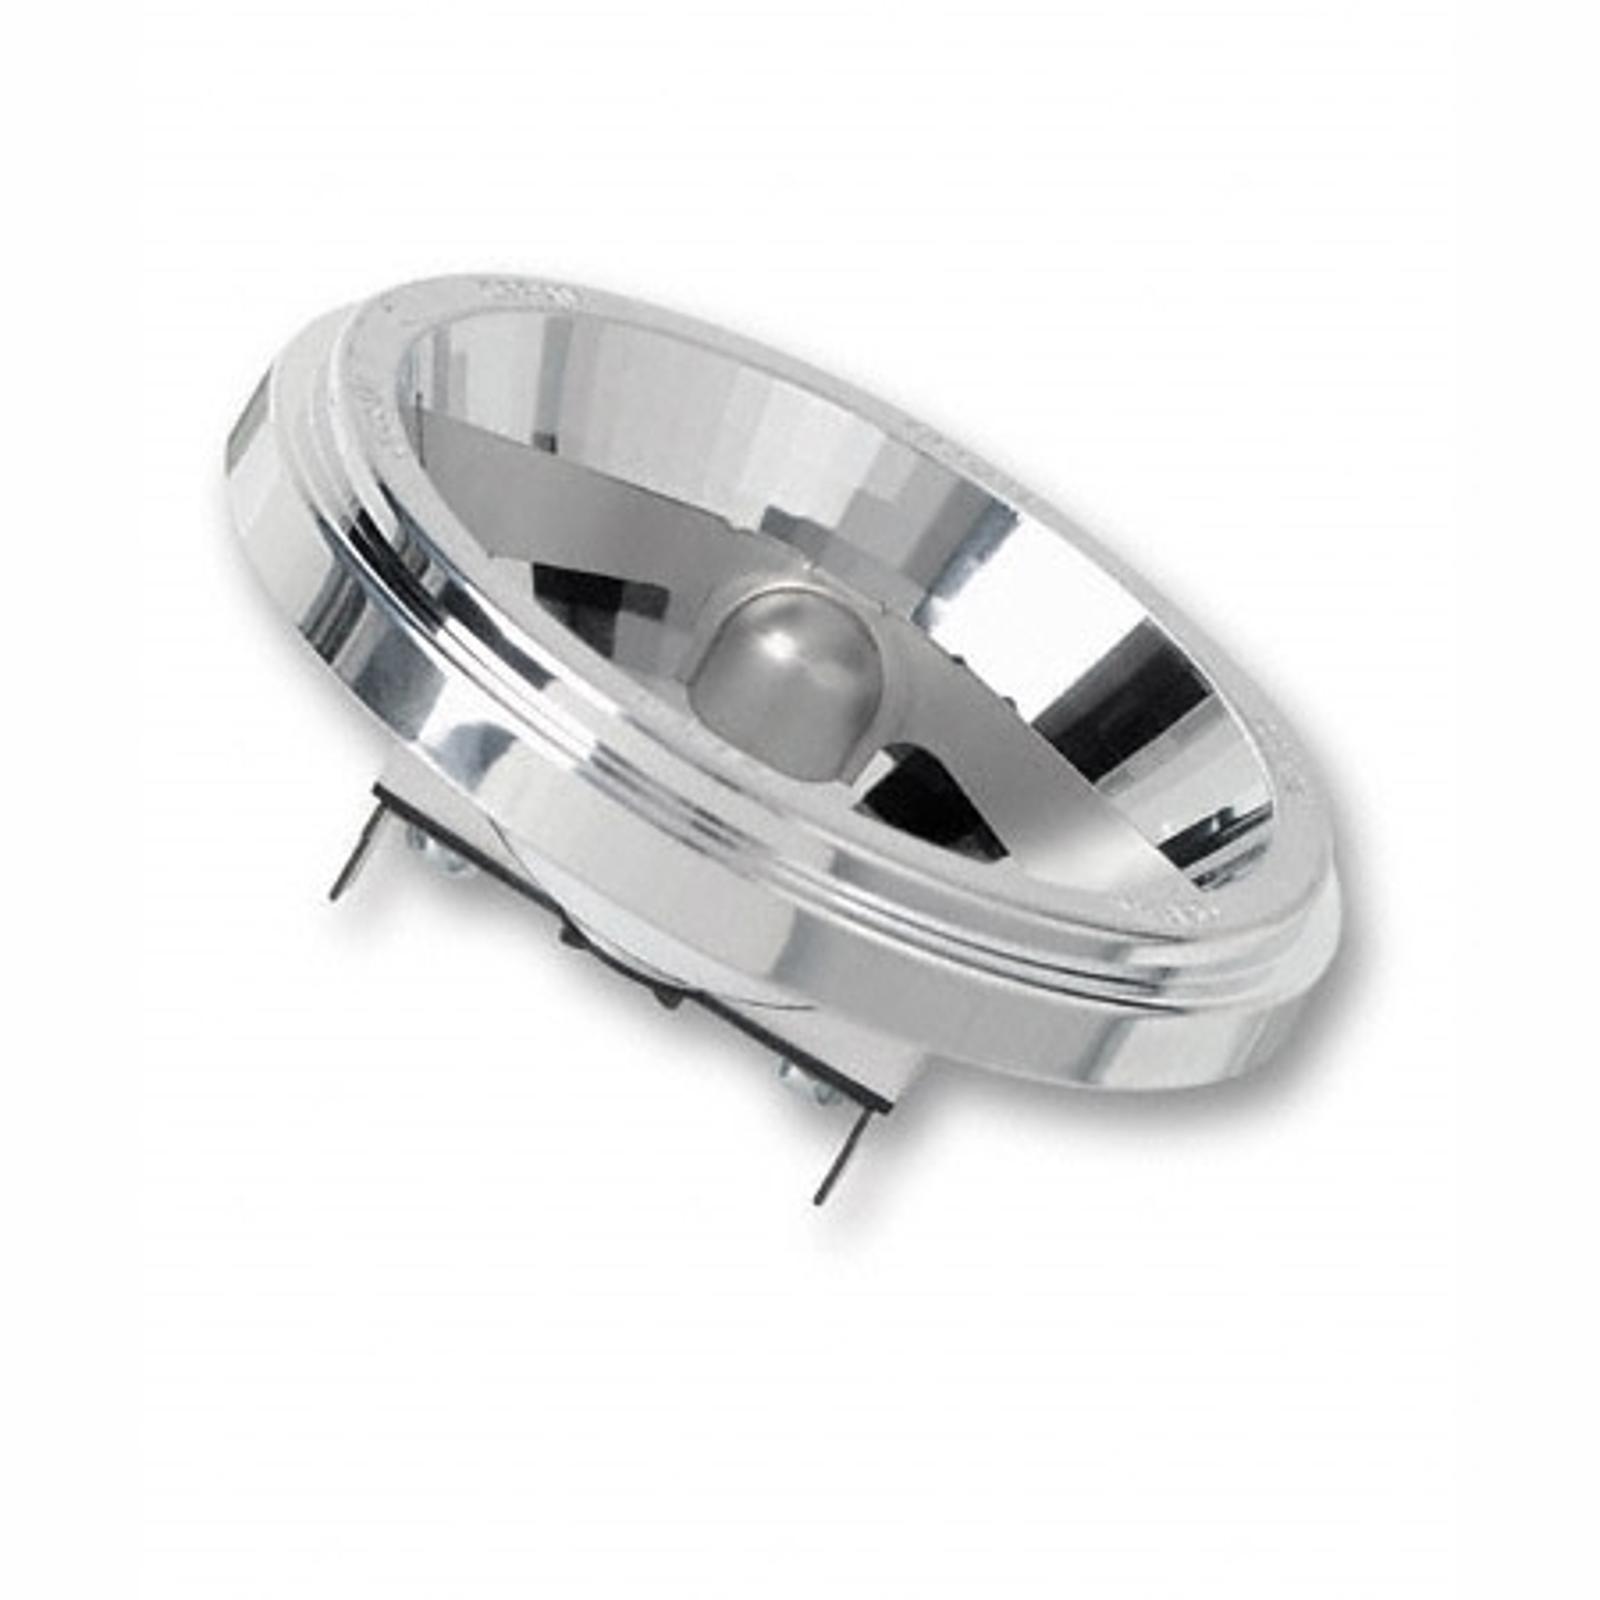 G53 50W 6° Reflektorlampe HALOSPOT 111